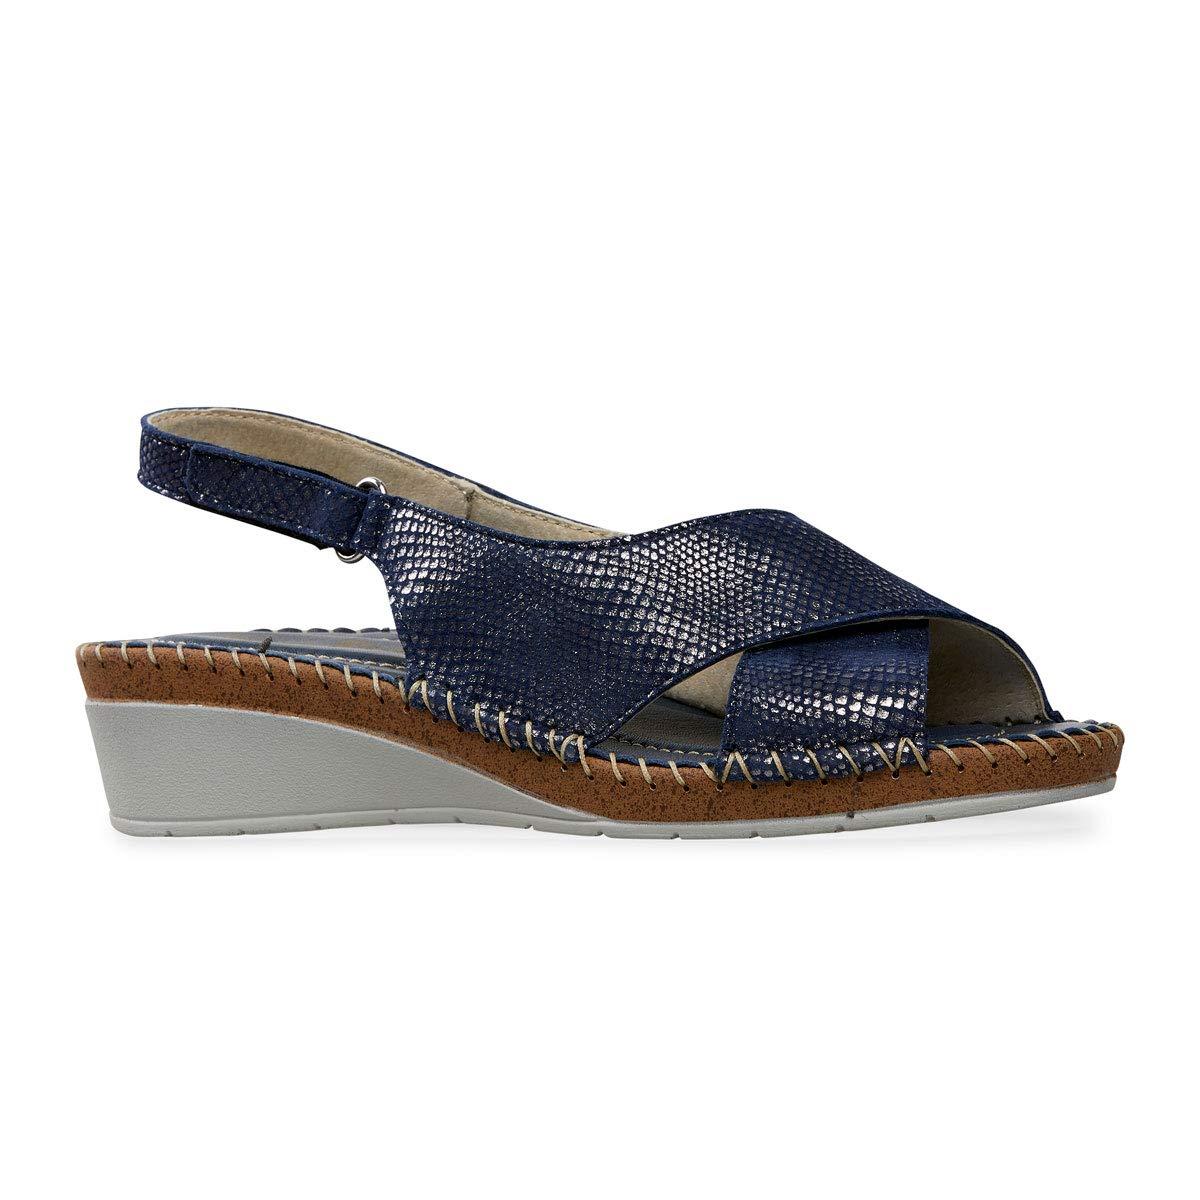 2c6a91af41a Van Dal Womens Faversham Wide E Fit Wedge Sandals